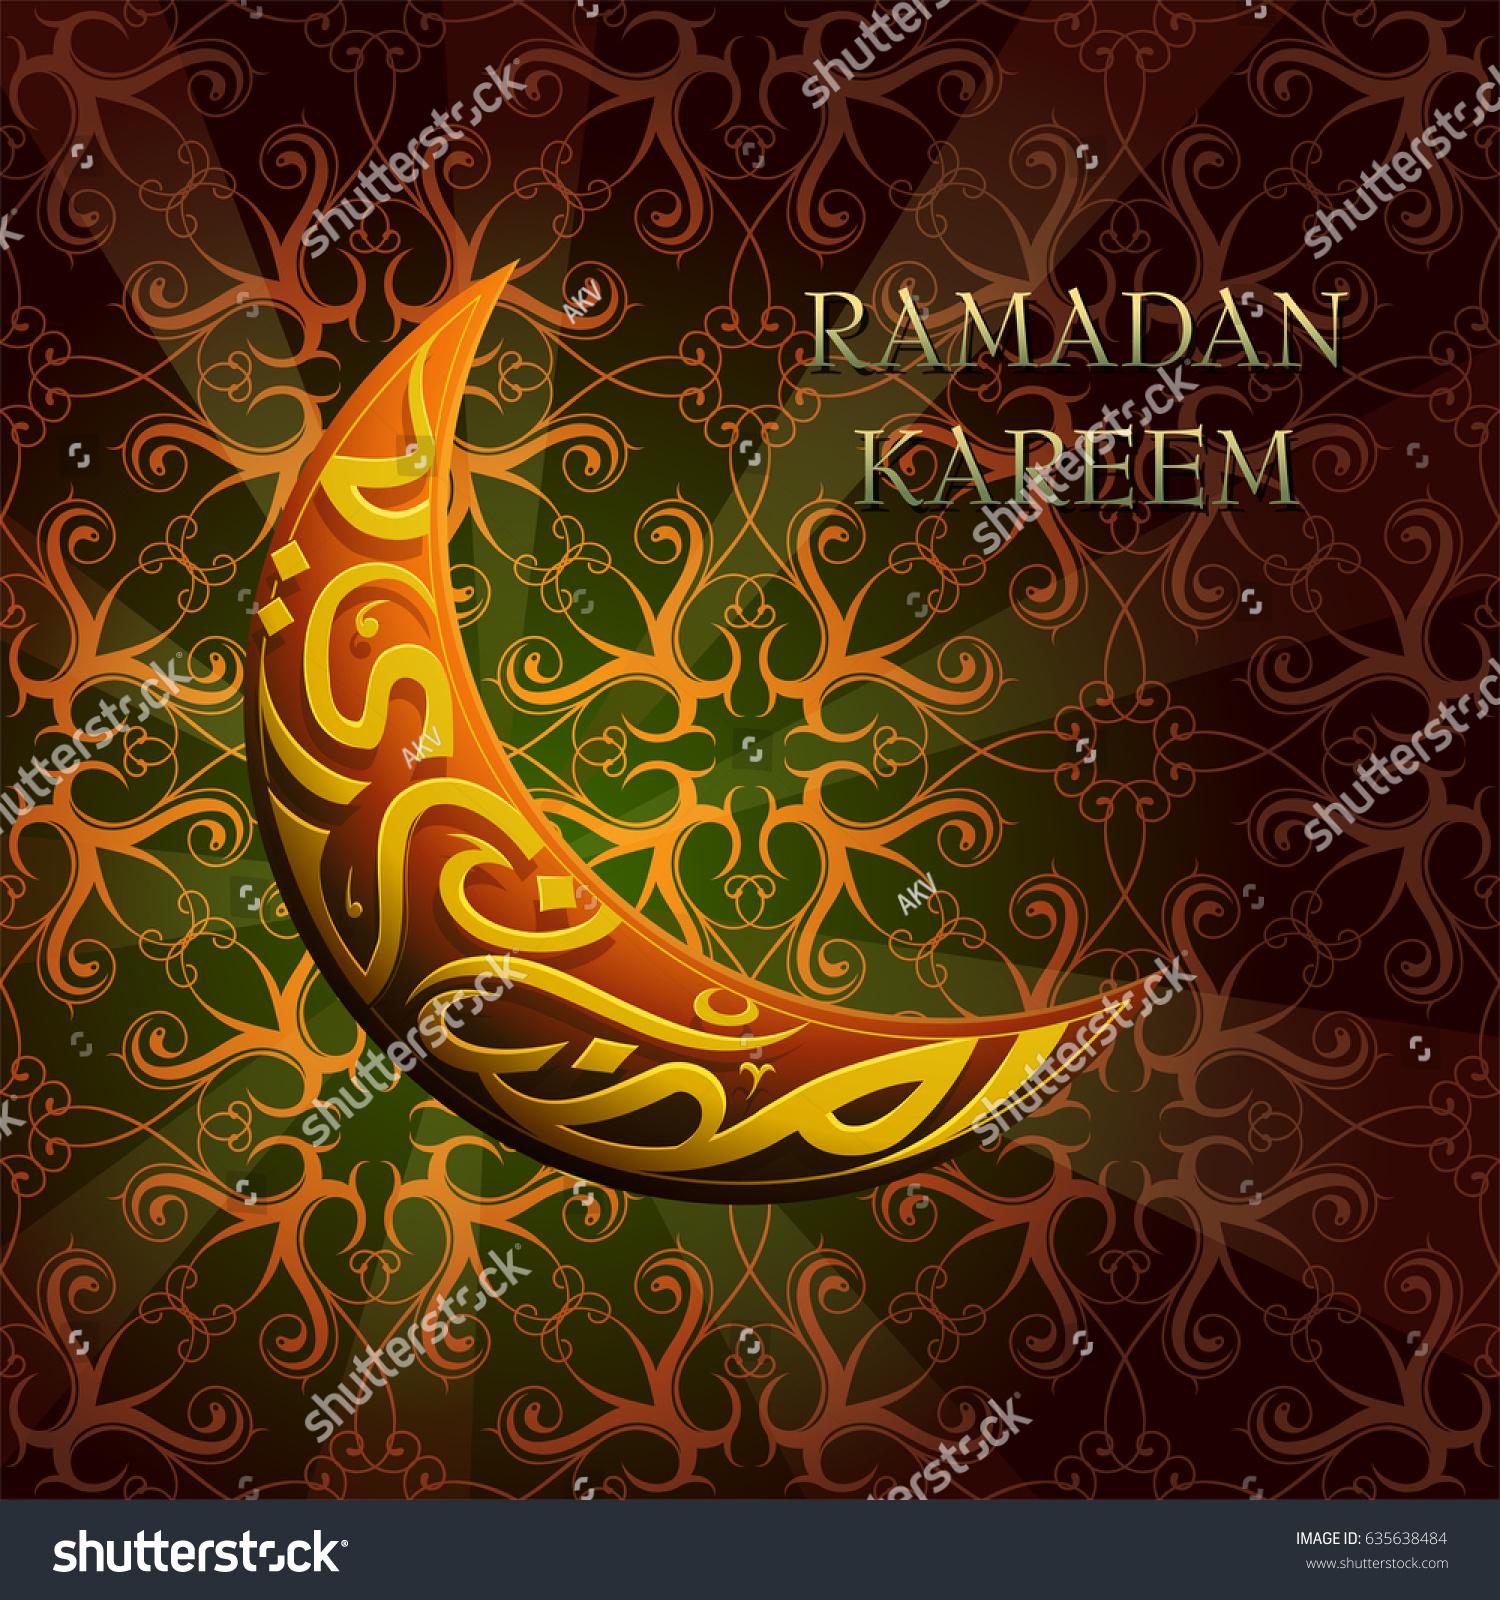 Ramadan greeting card design calligraphy ornament stock vector ramadan greeting card design with calligraphy ornament on the moon ramadan kareem translation bless kristyandbryce Image collections